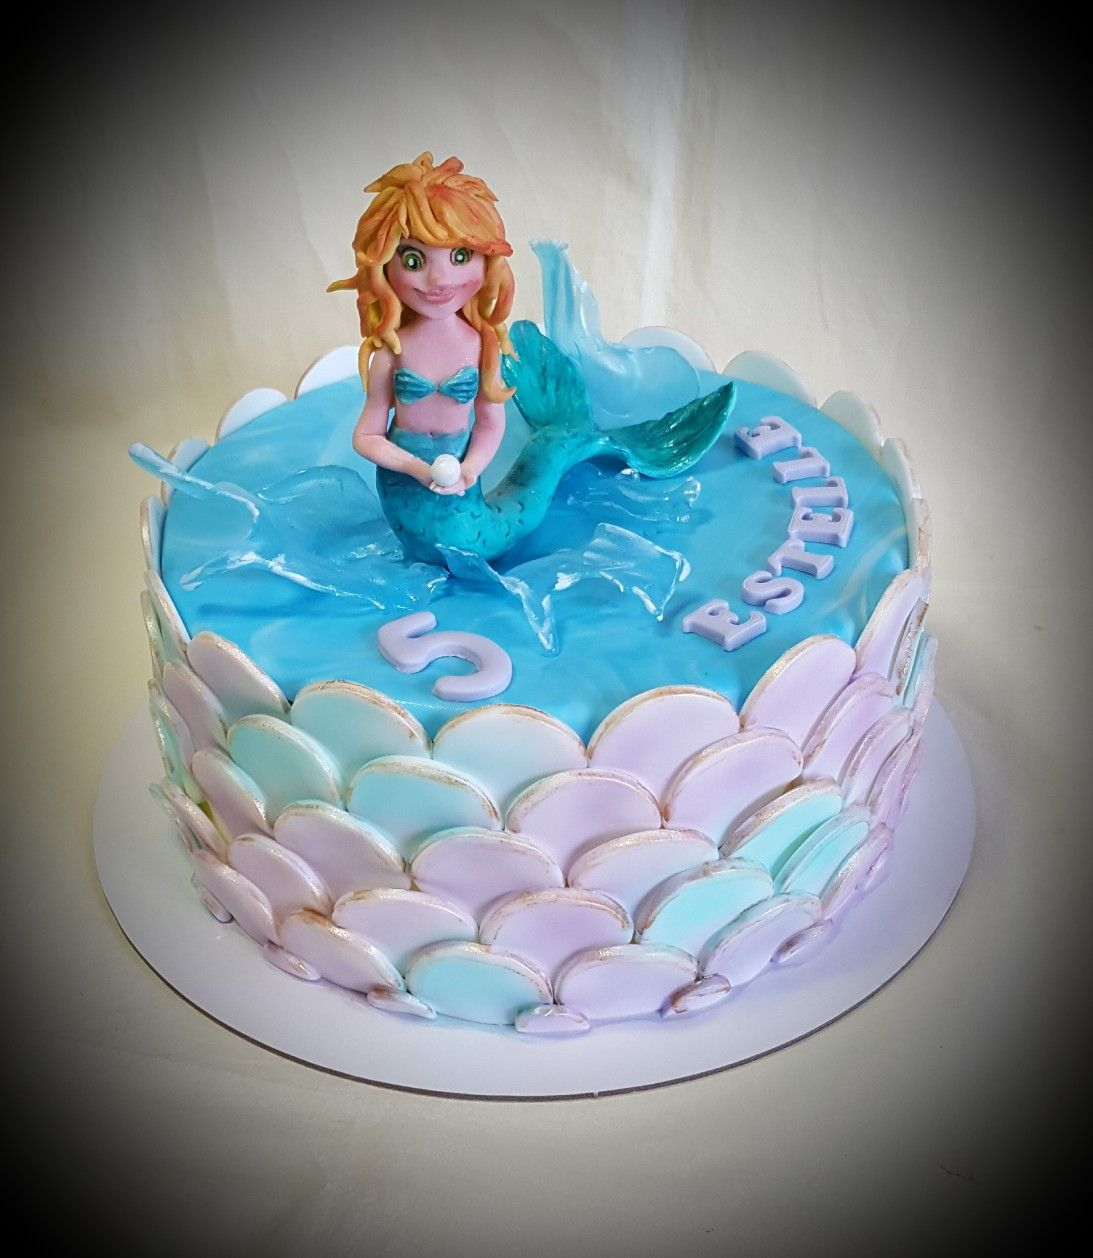 kuchen meerjungfrau